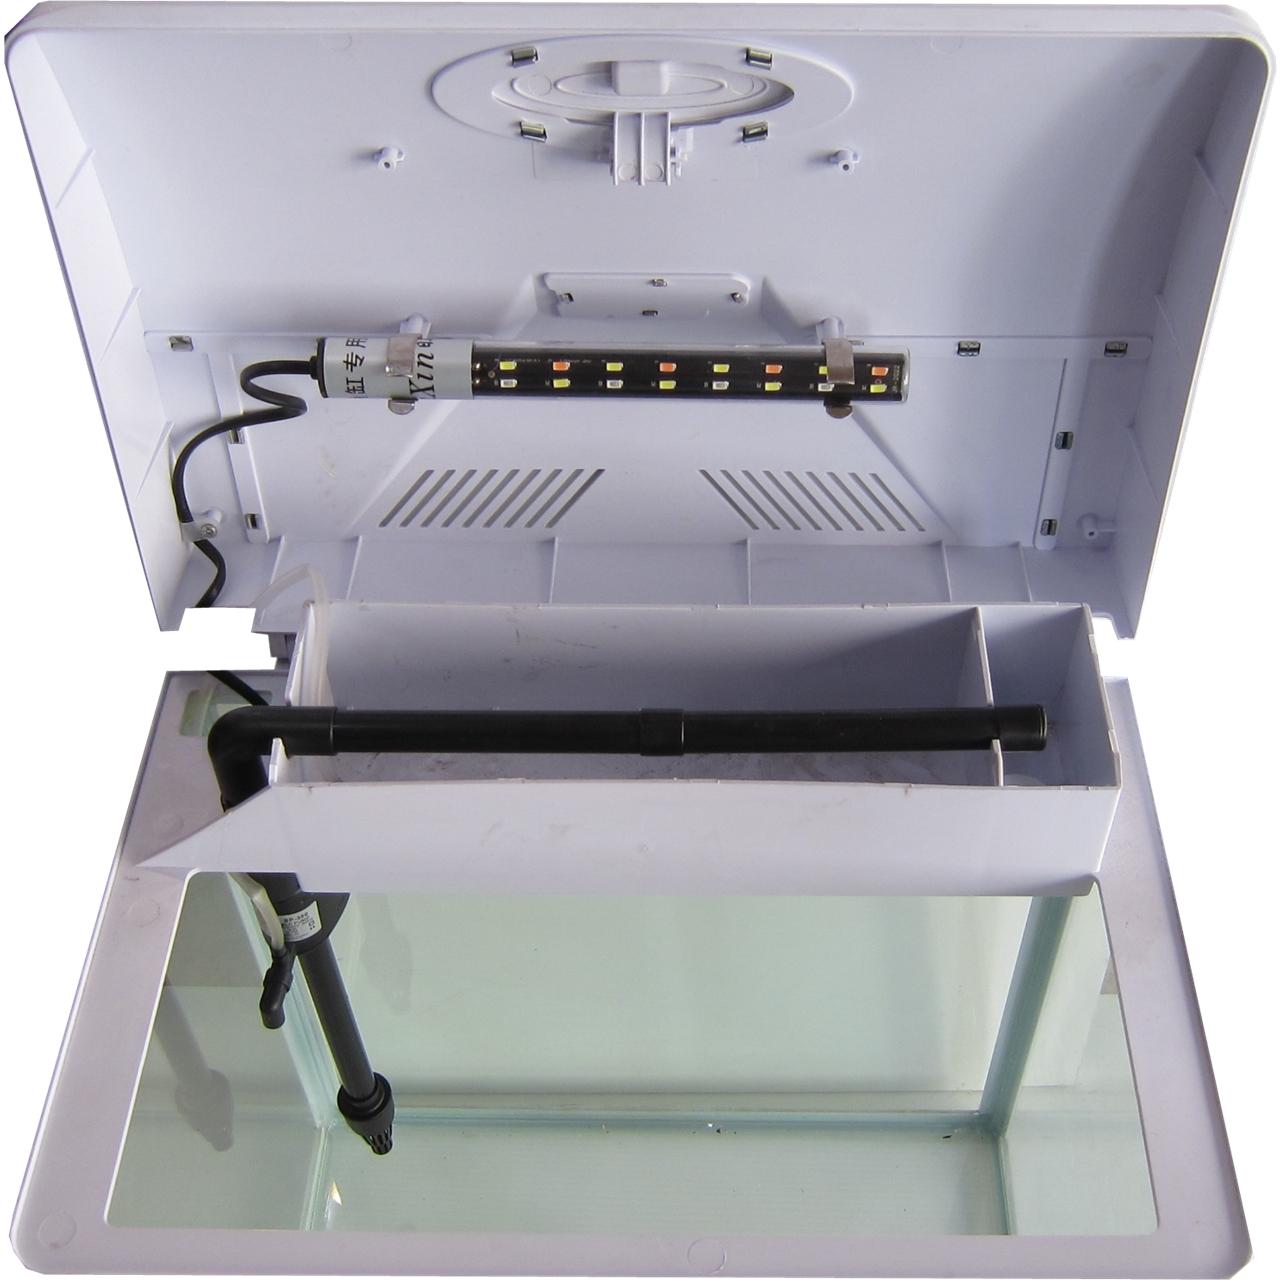 آکواریوم مکانیزه ریکسین مدل 420 حجم 50 لیتر